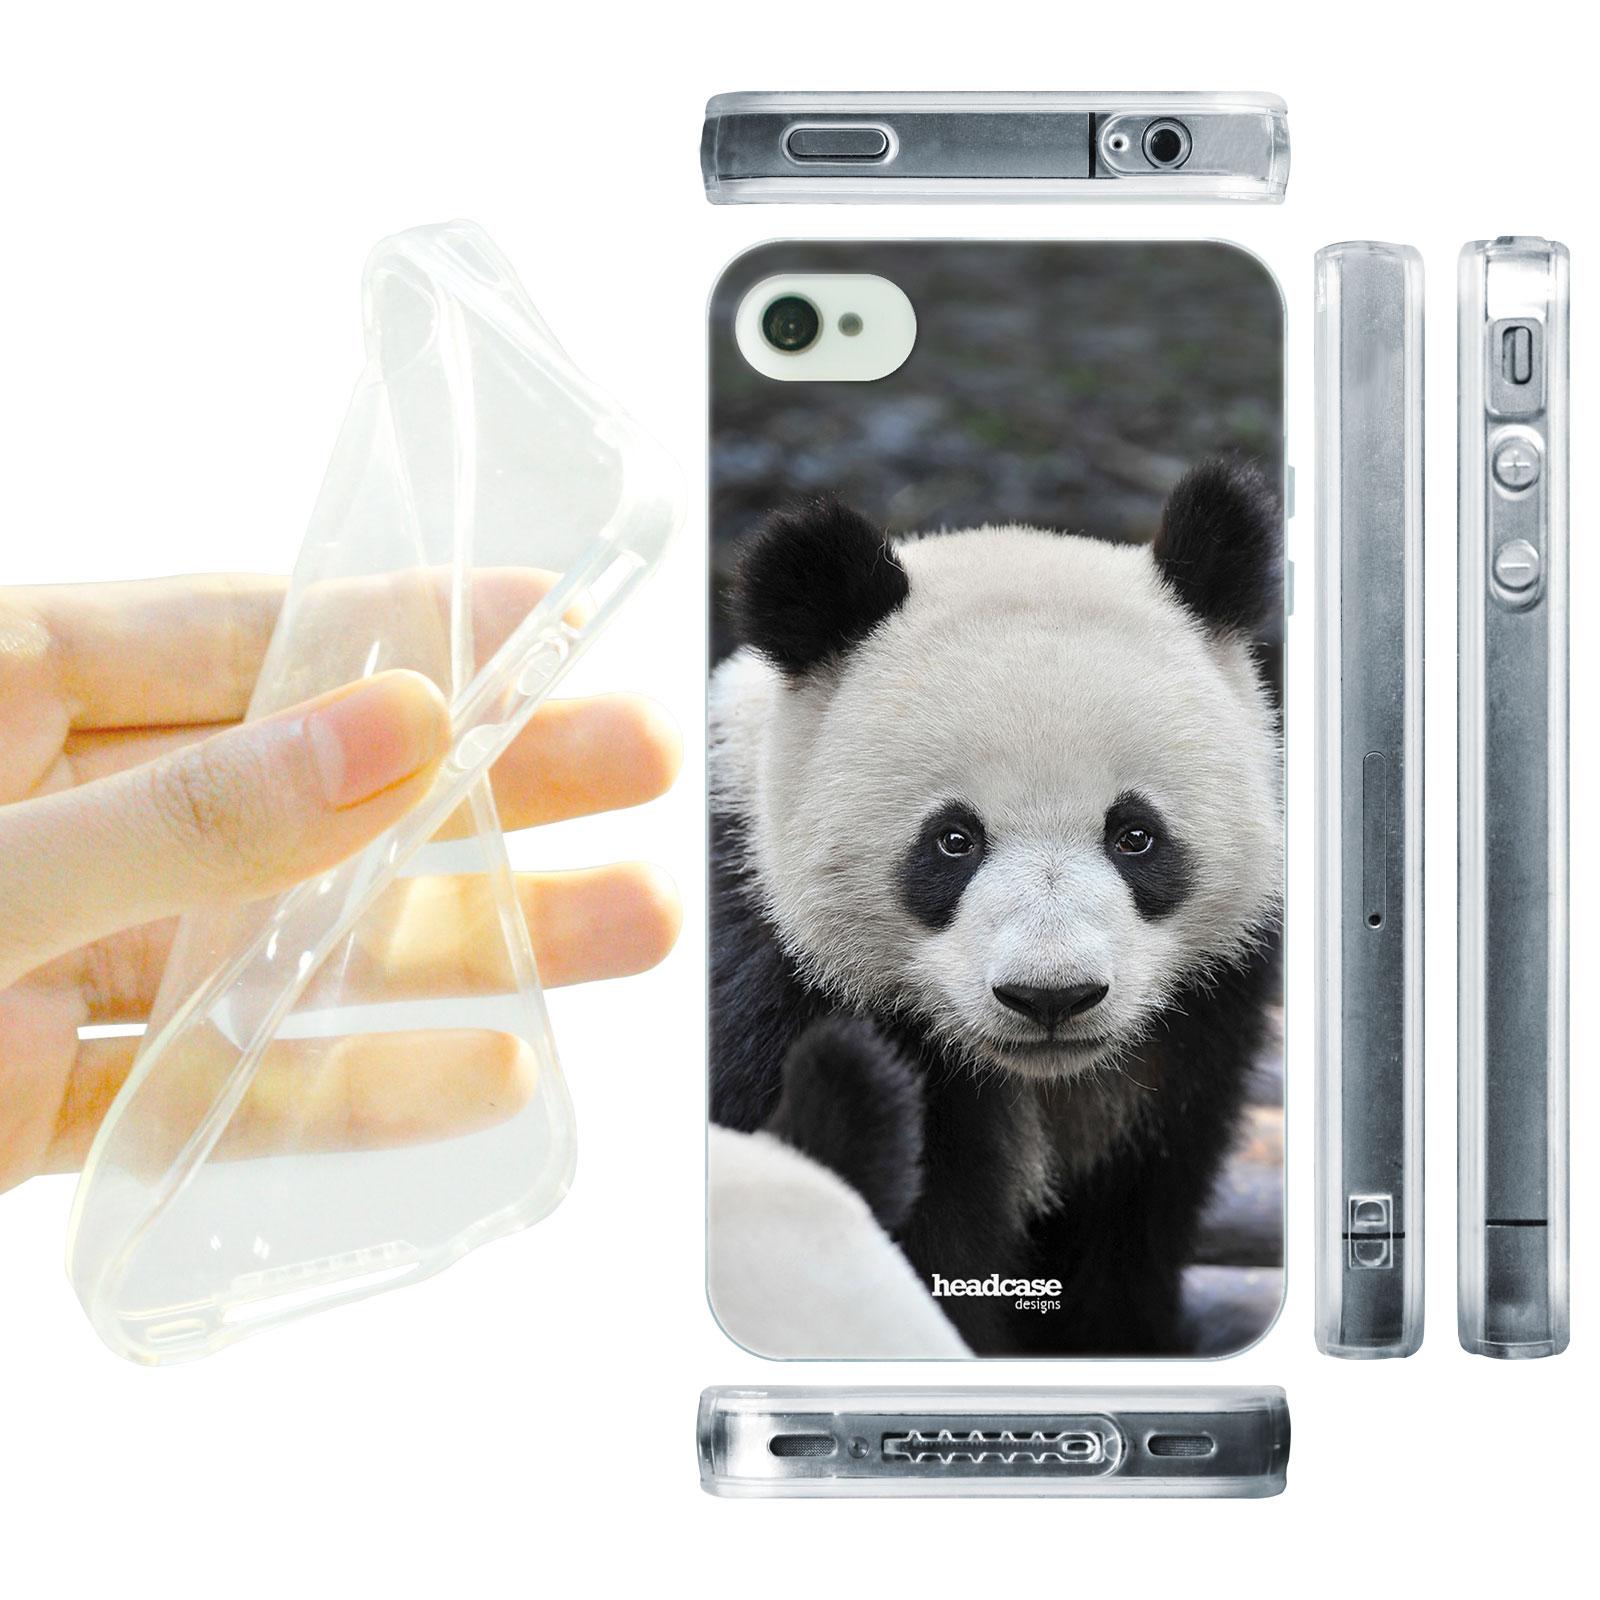 HEAD CASE silikonový obal na mobil Iphone 4 4S divočina černá a bílá barva  medvídek panda ee9d3c1e319